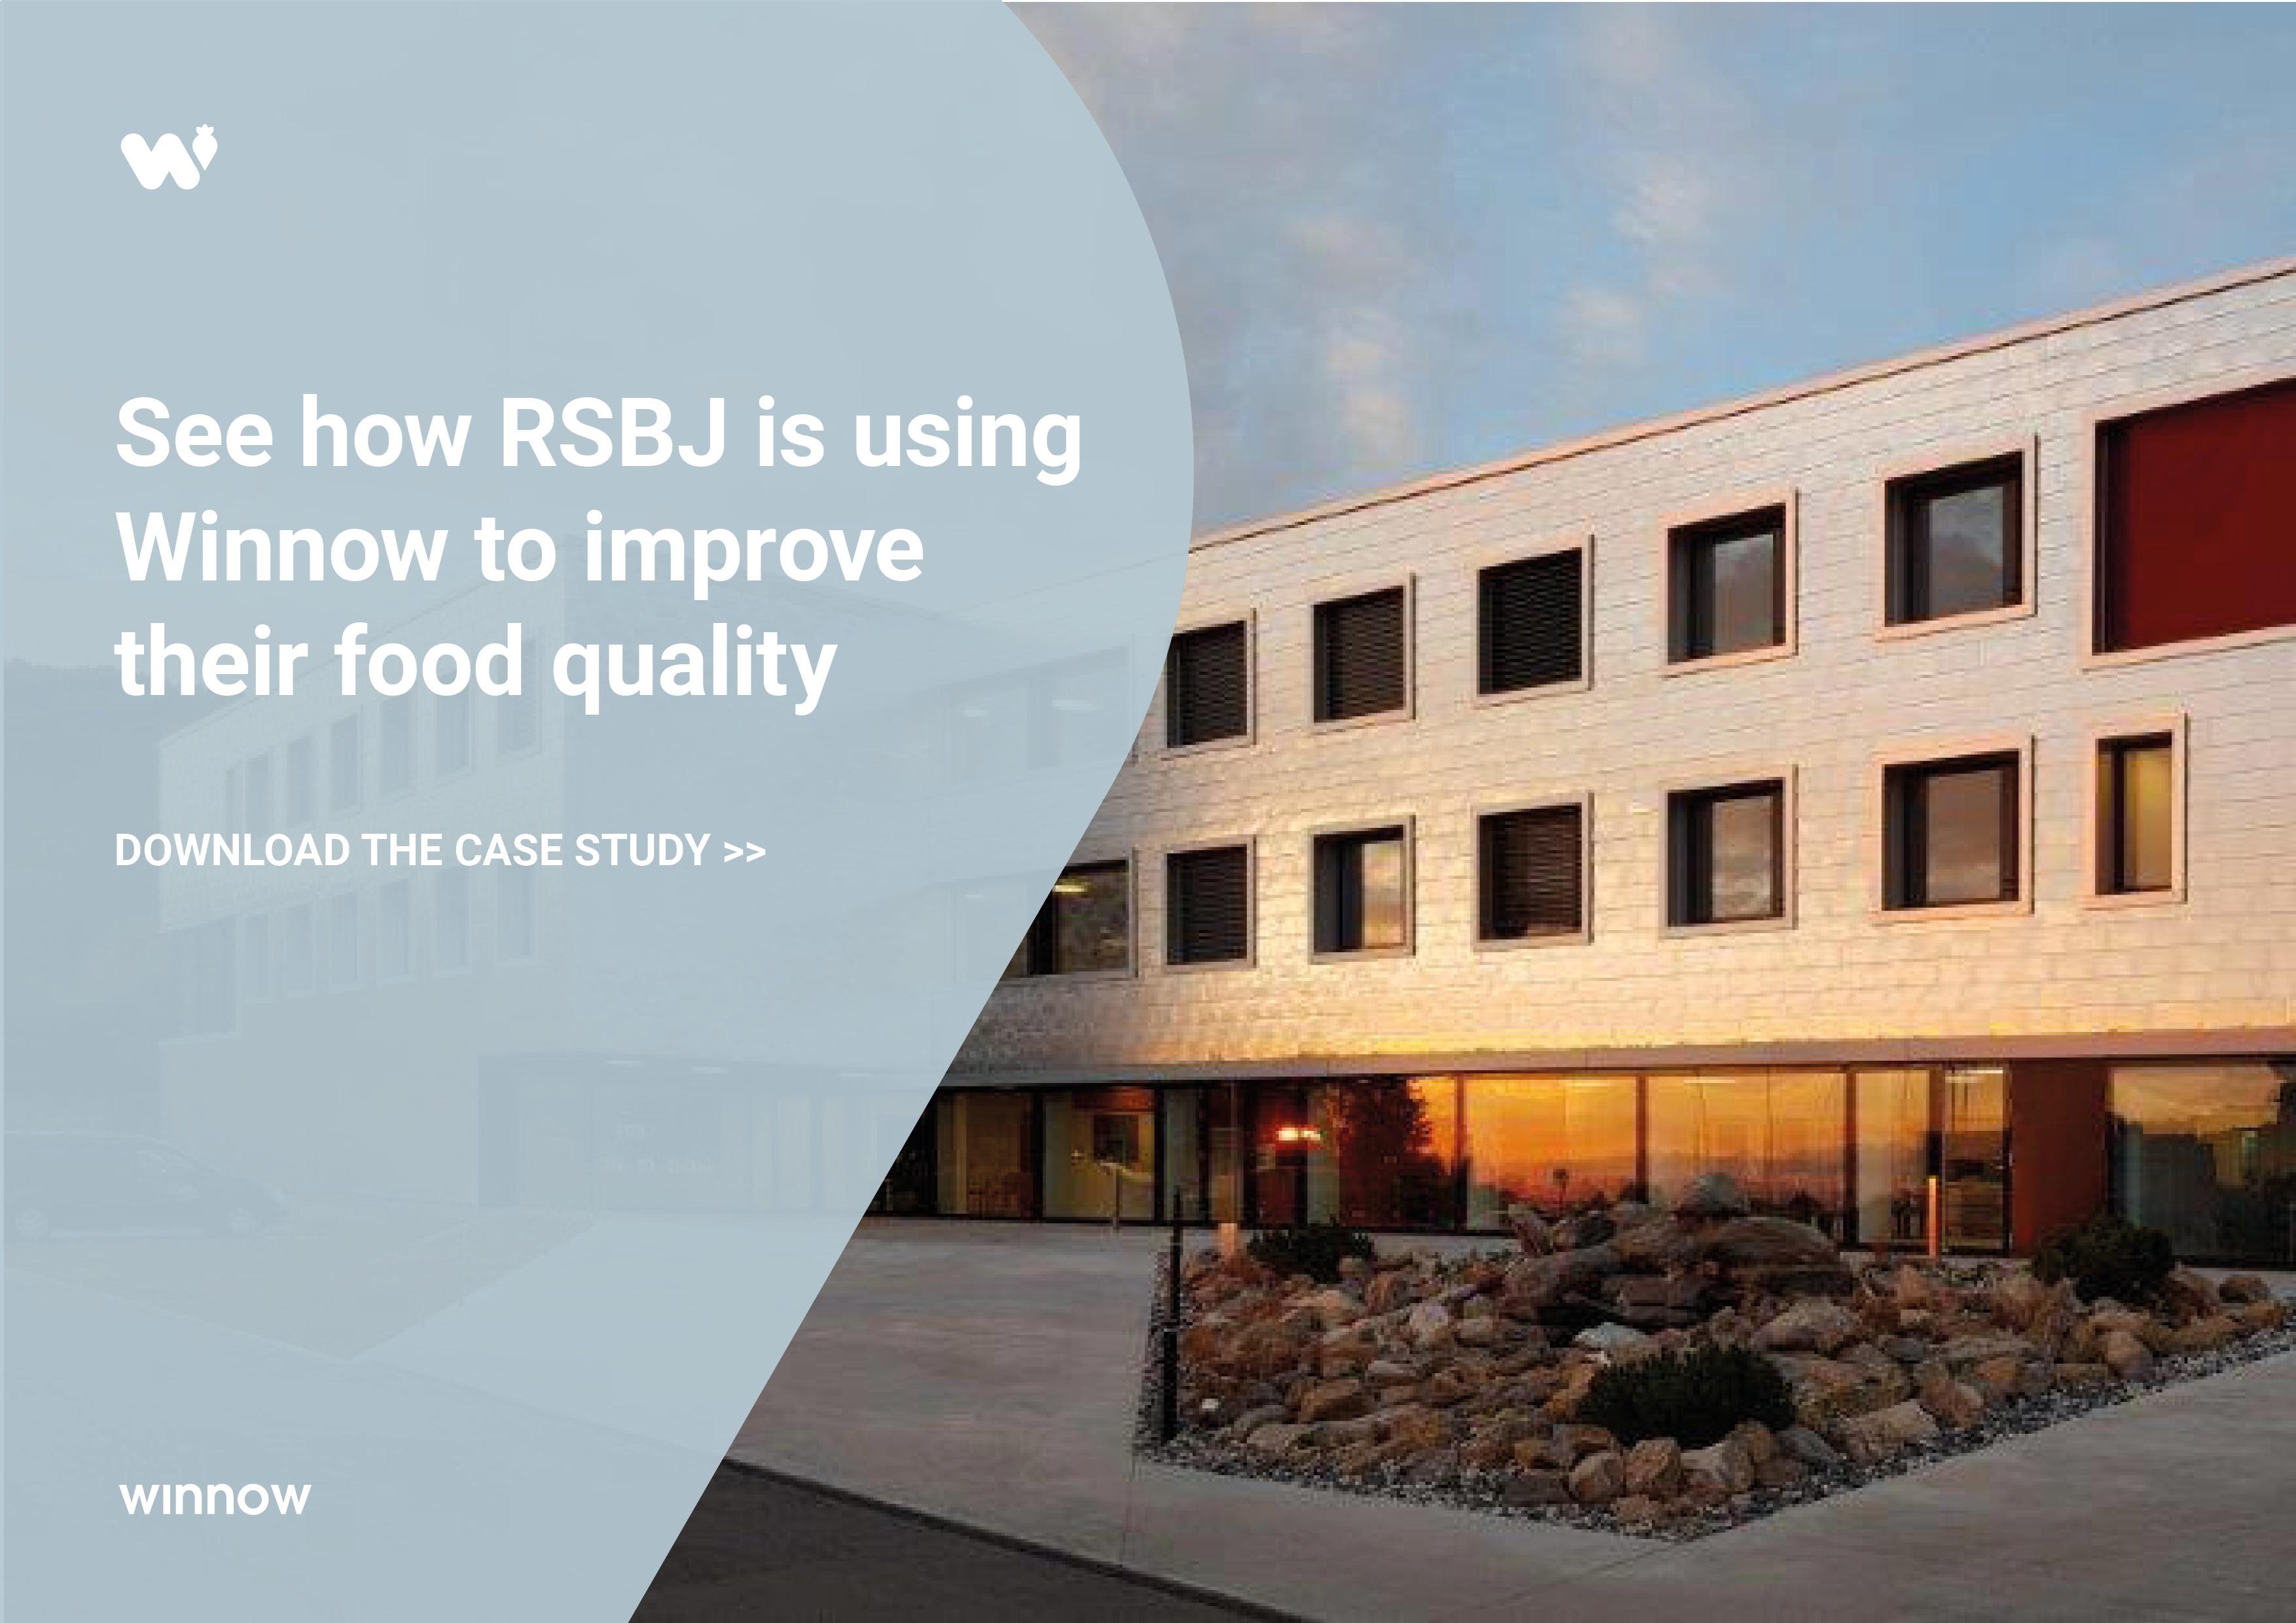 RSBJ case study